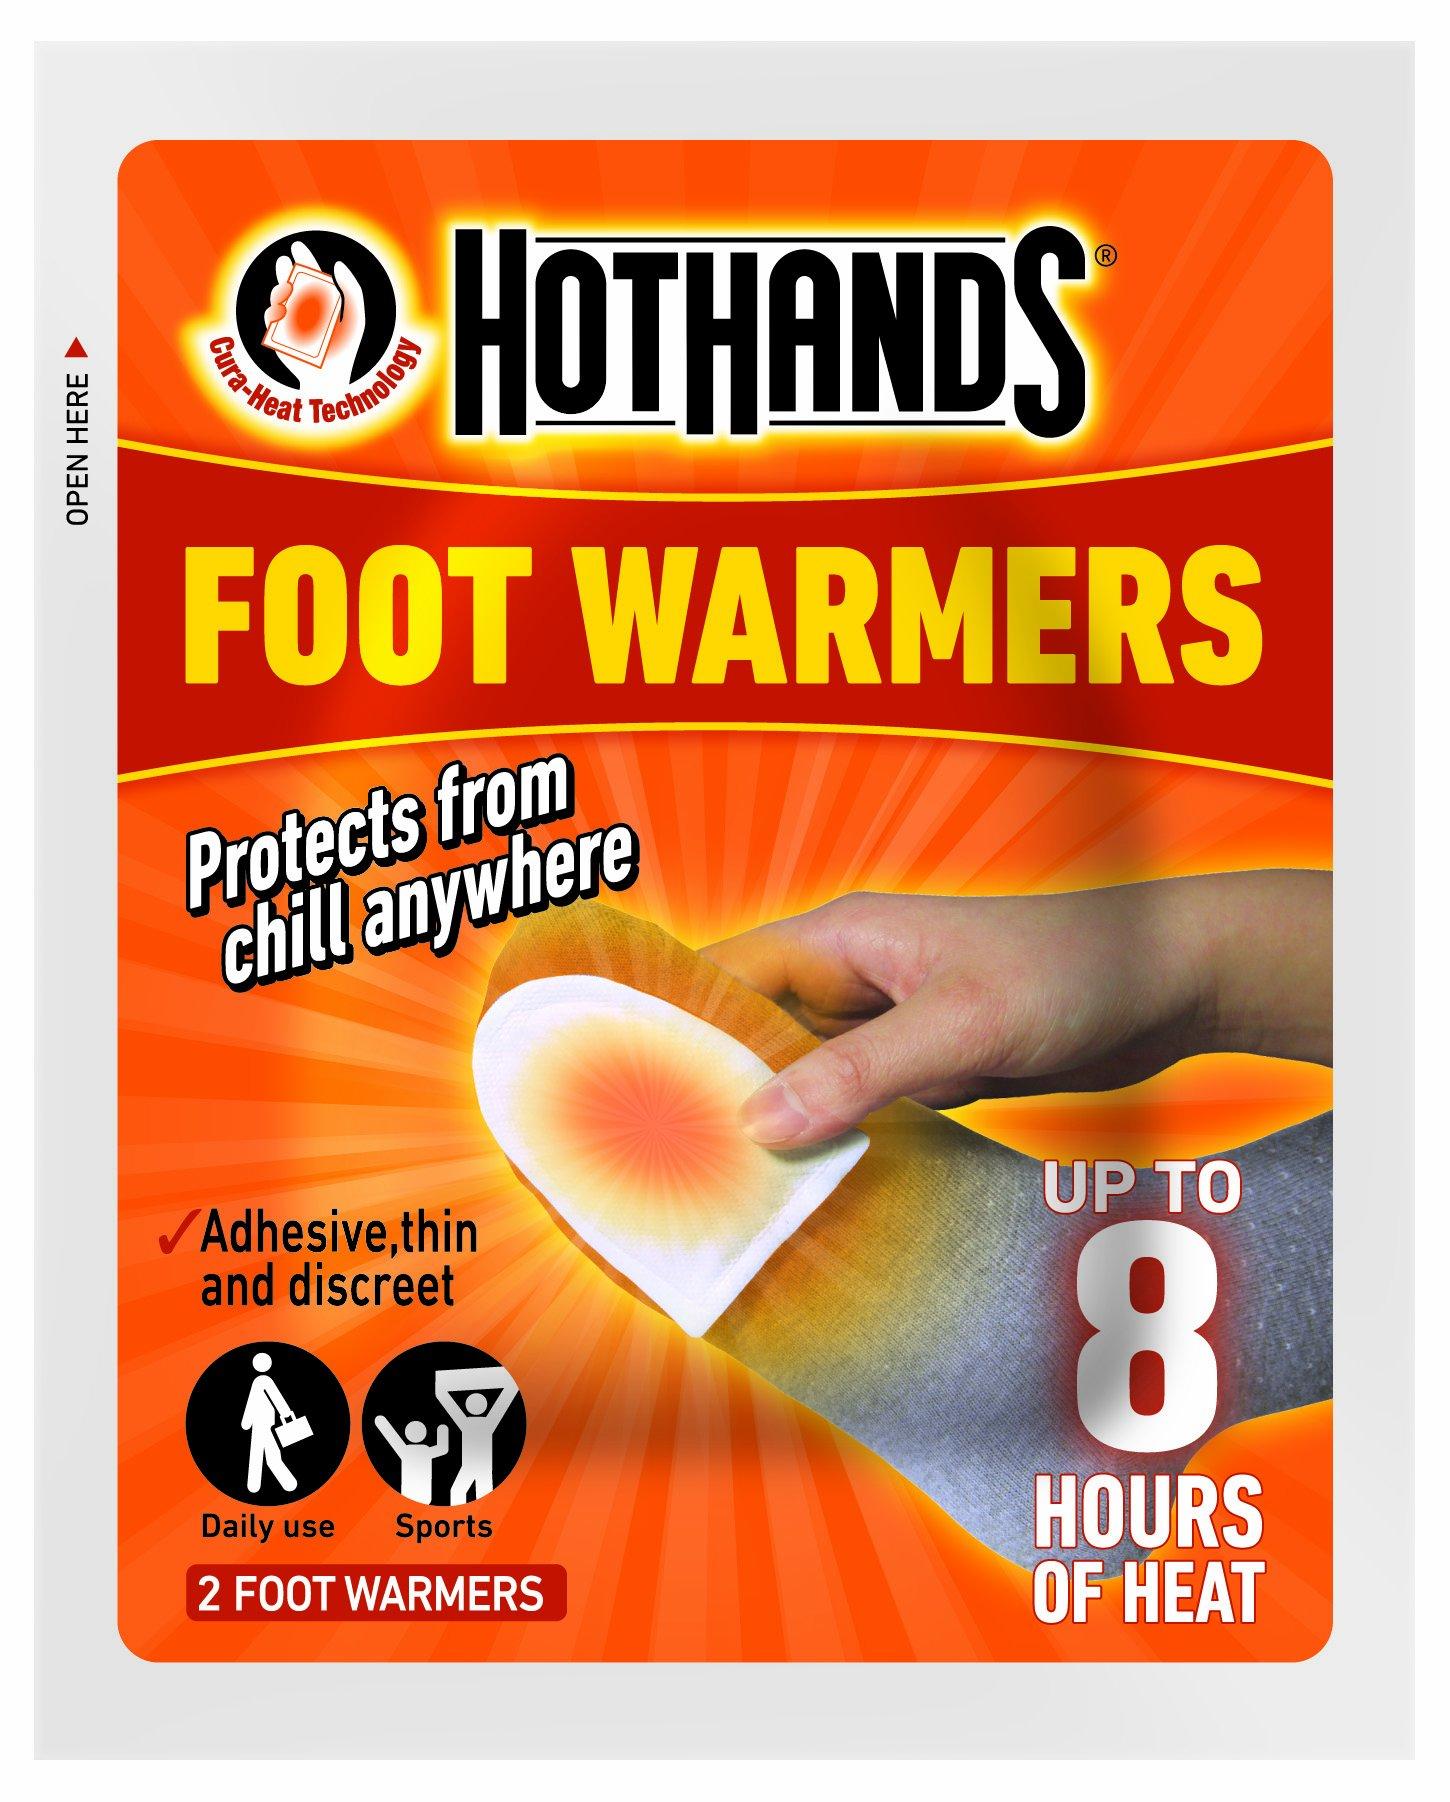 HeatMax Hot Hands Foot Warmers 6 pairs